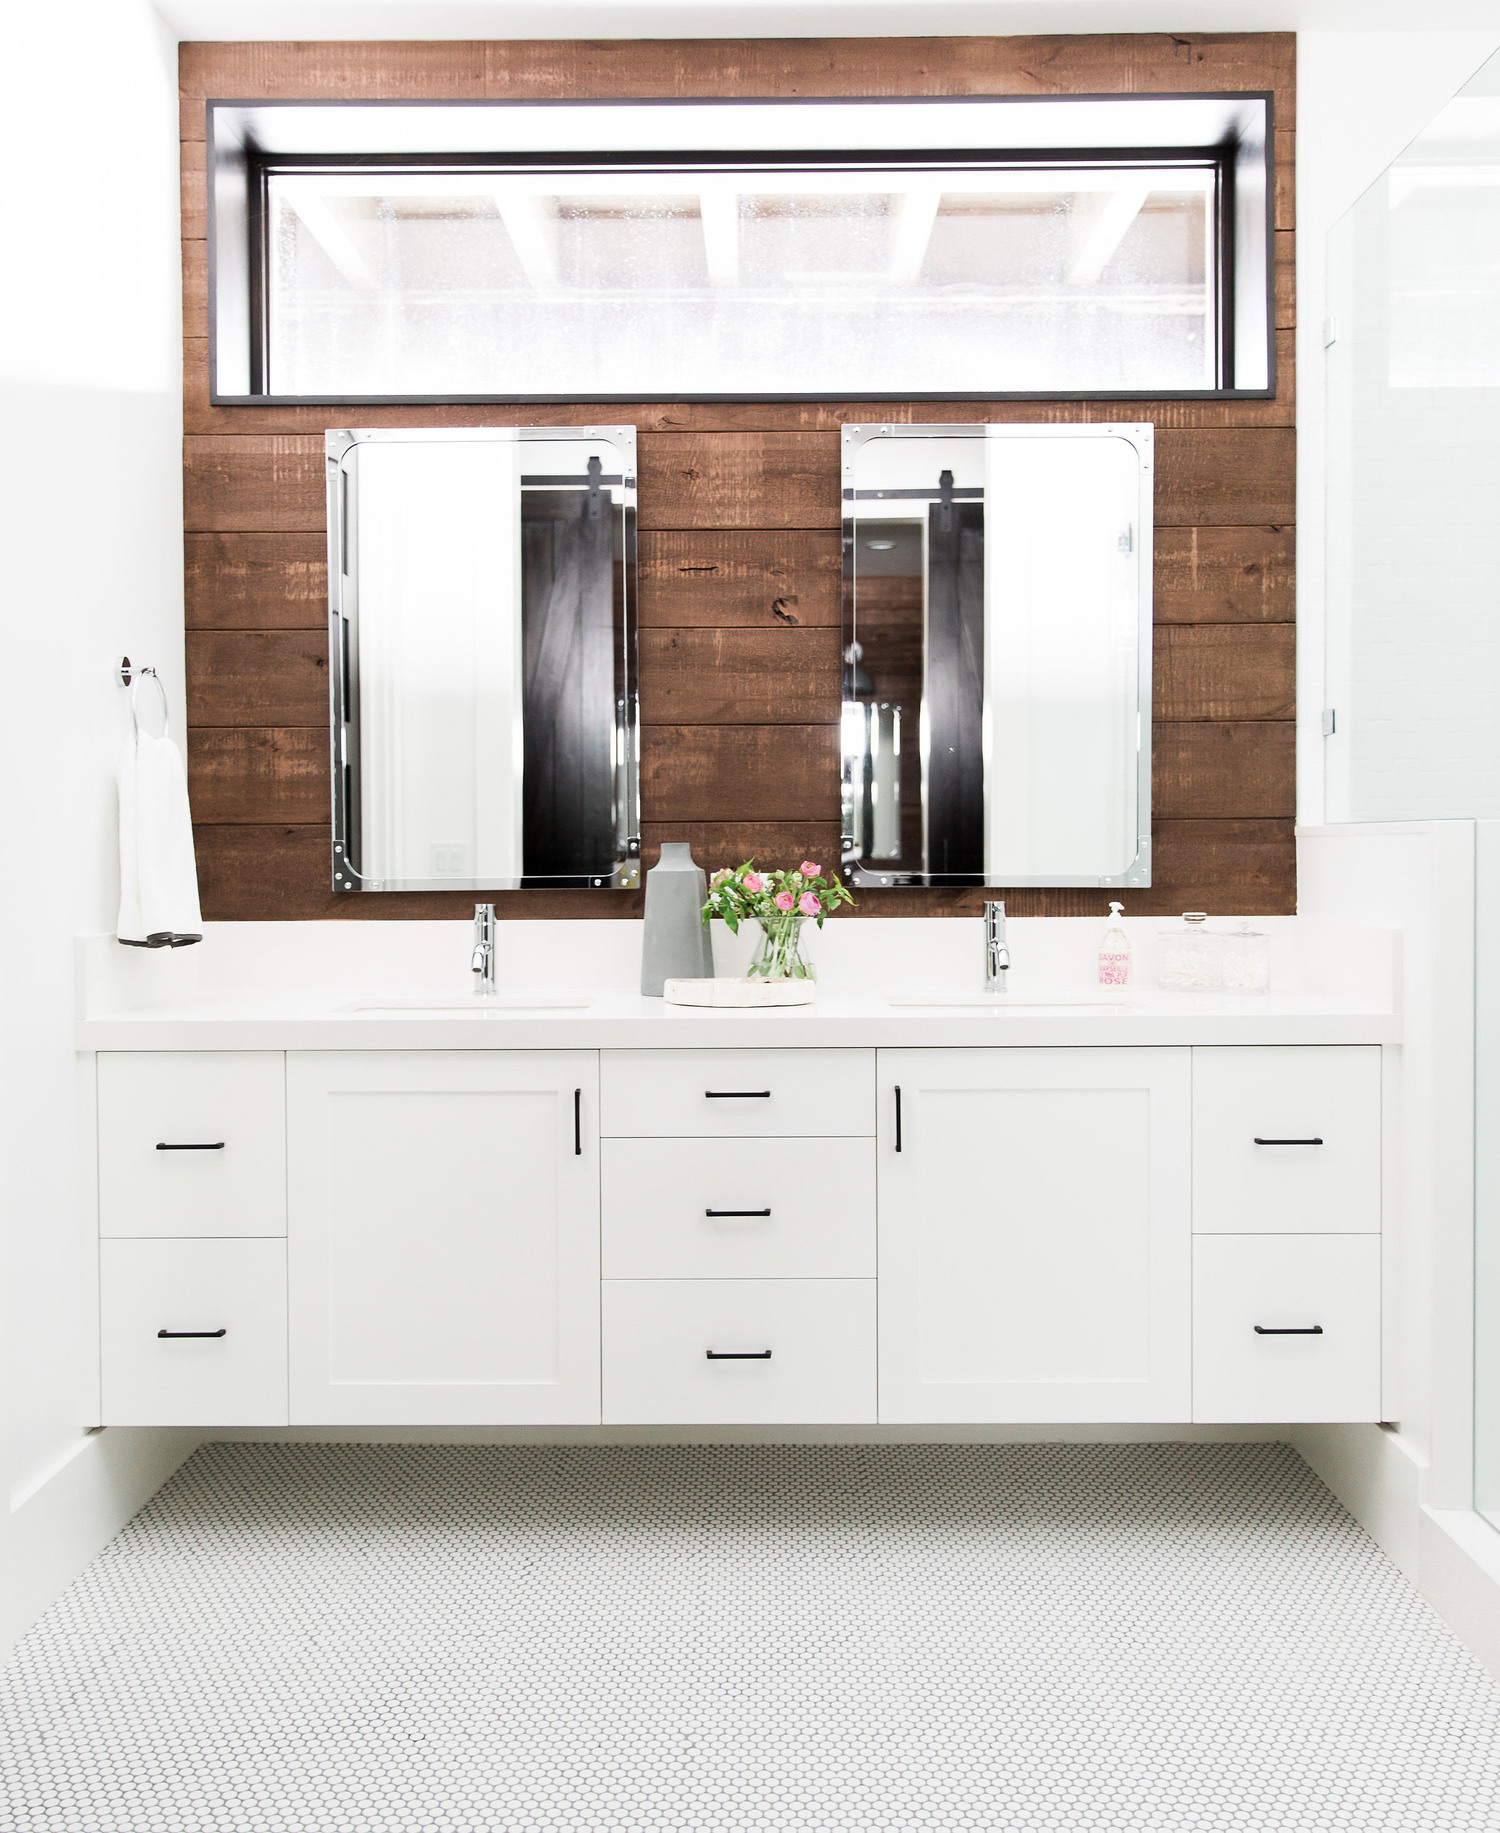 Double sink and mirror bathroom vanity